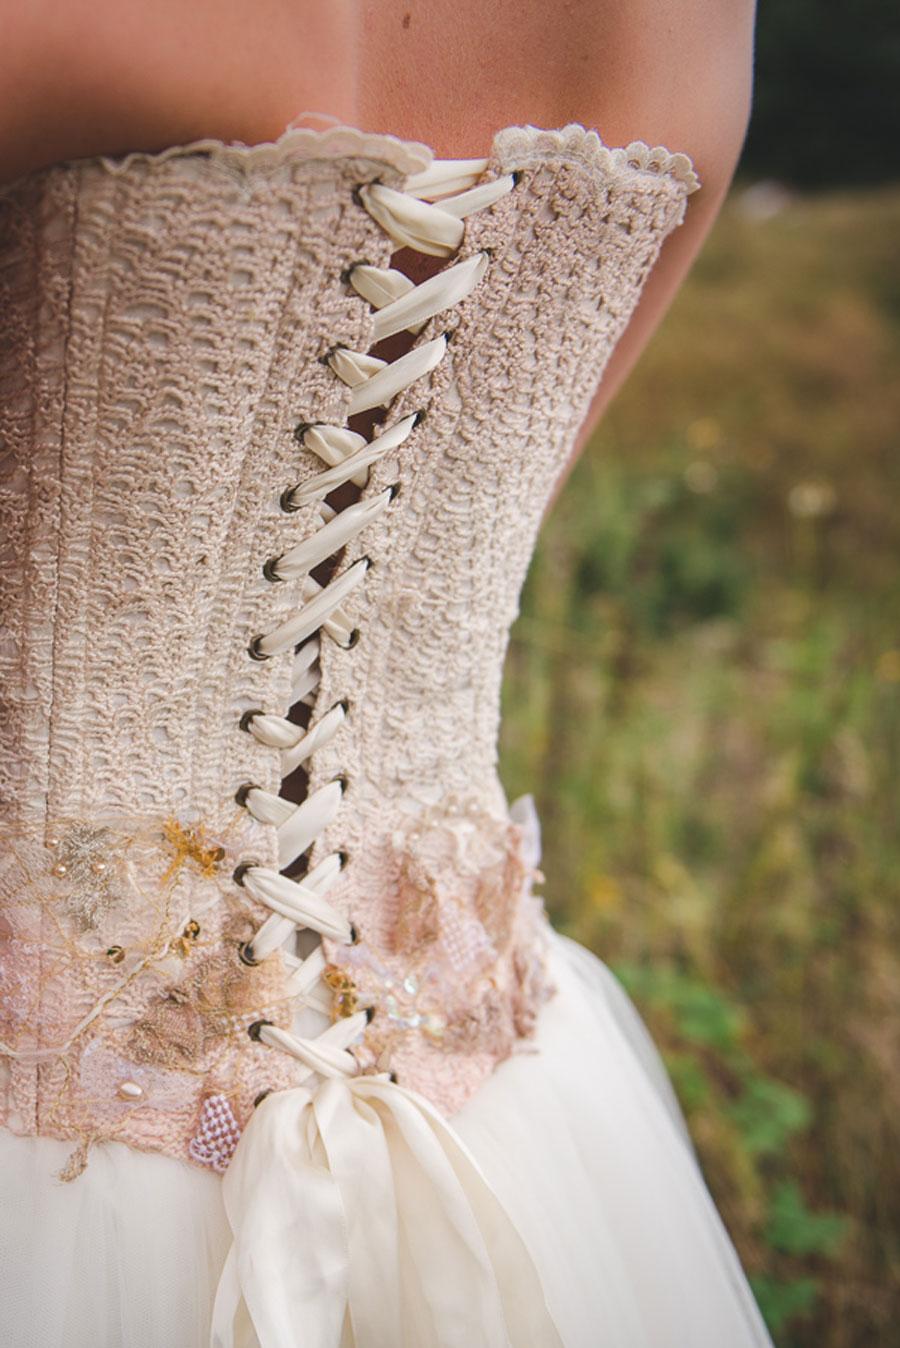 A Late Summer Renaissance-Meets-Fantasy Themed Bridal Shoot0037